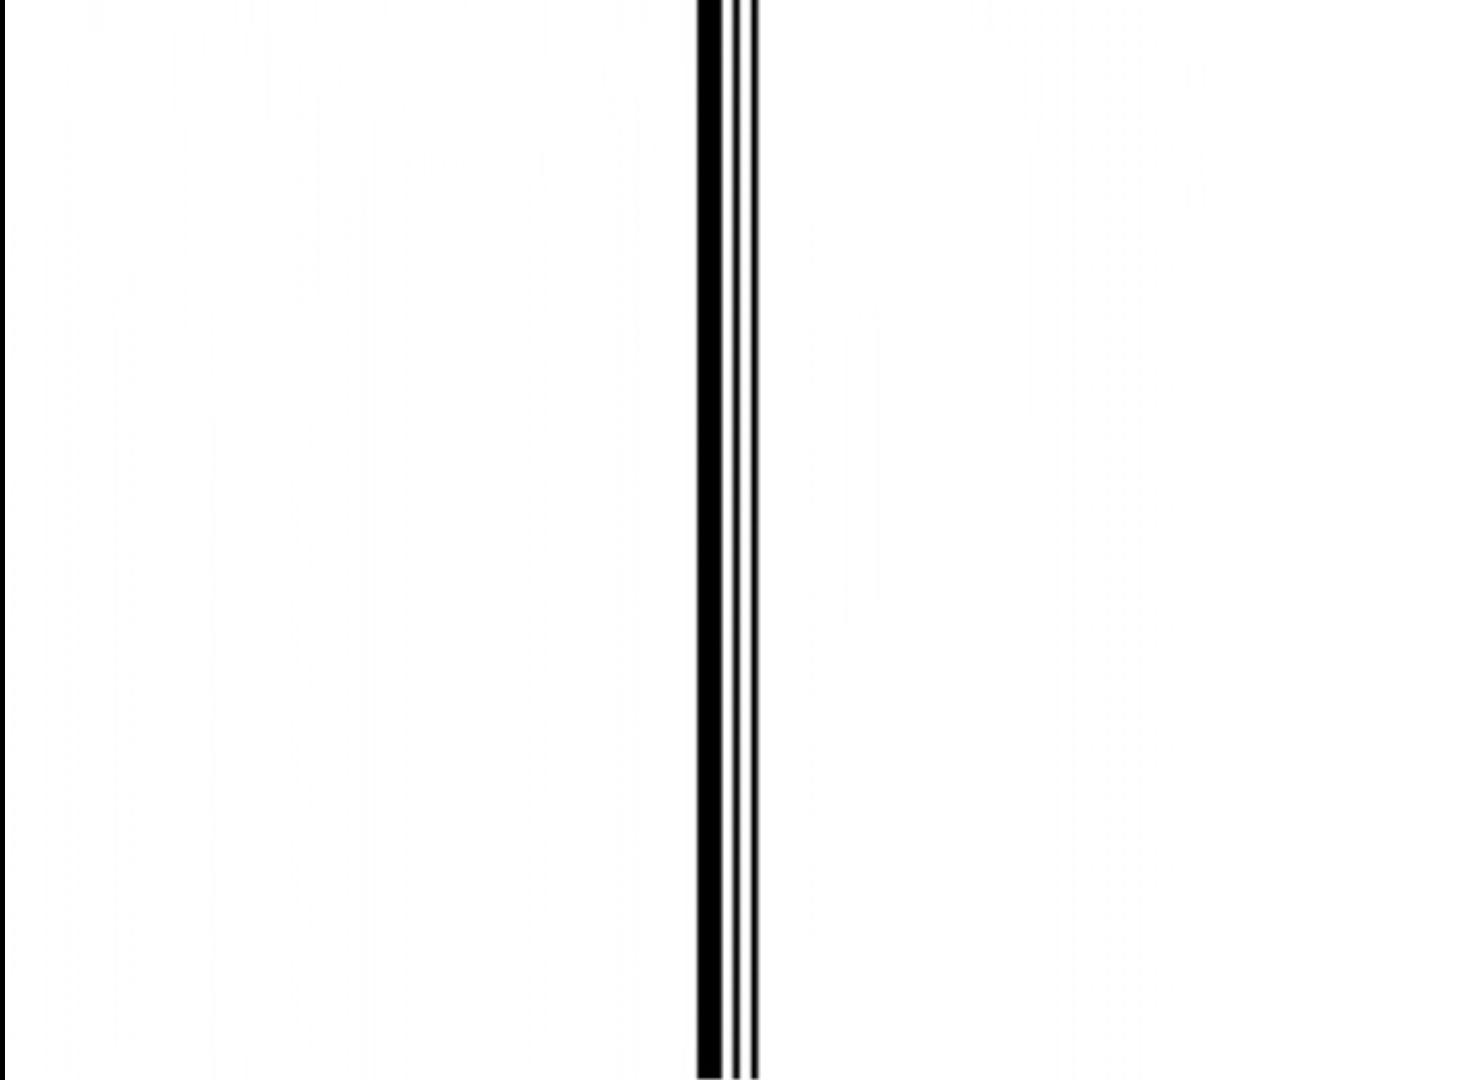 [Bar-ale]'s2